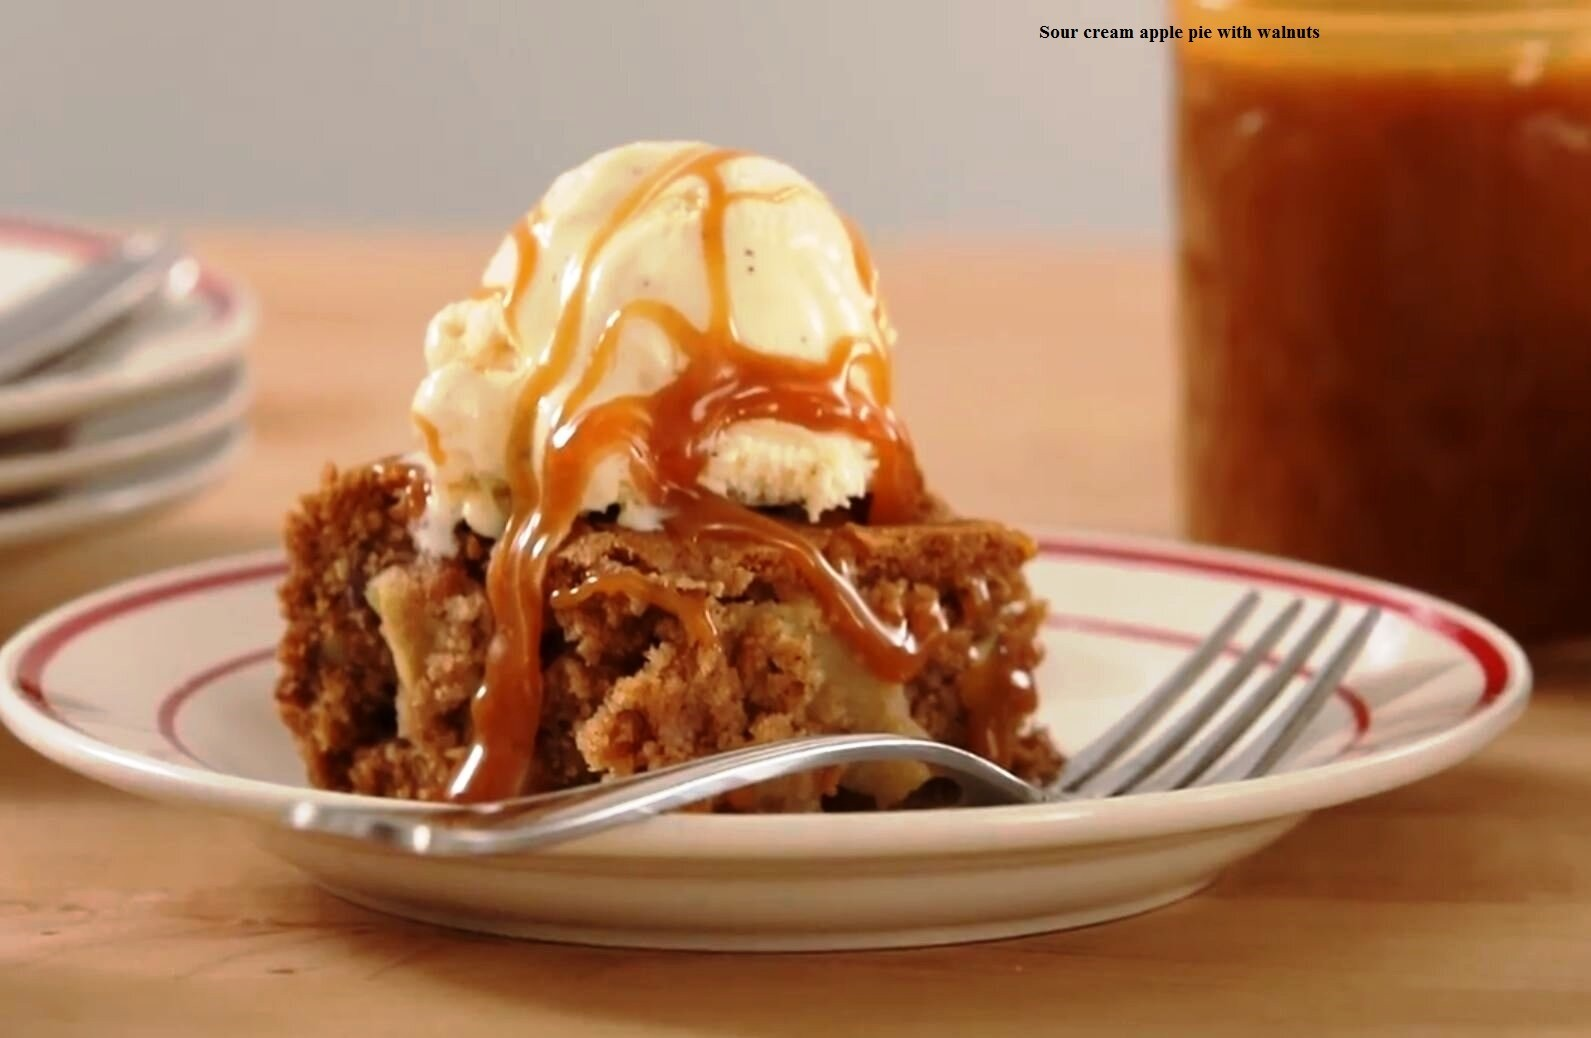 Recipe Sour Cream Apple Pie with Walnuts